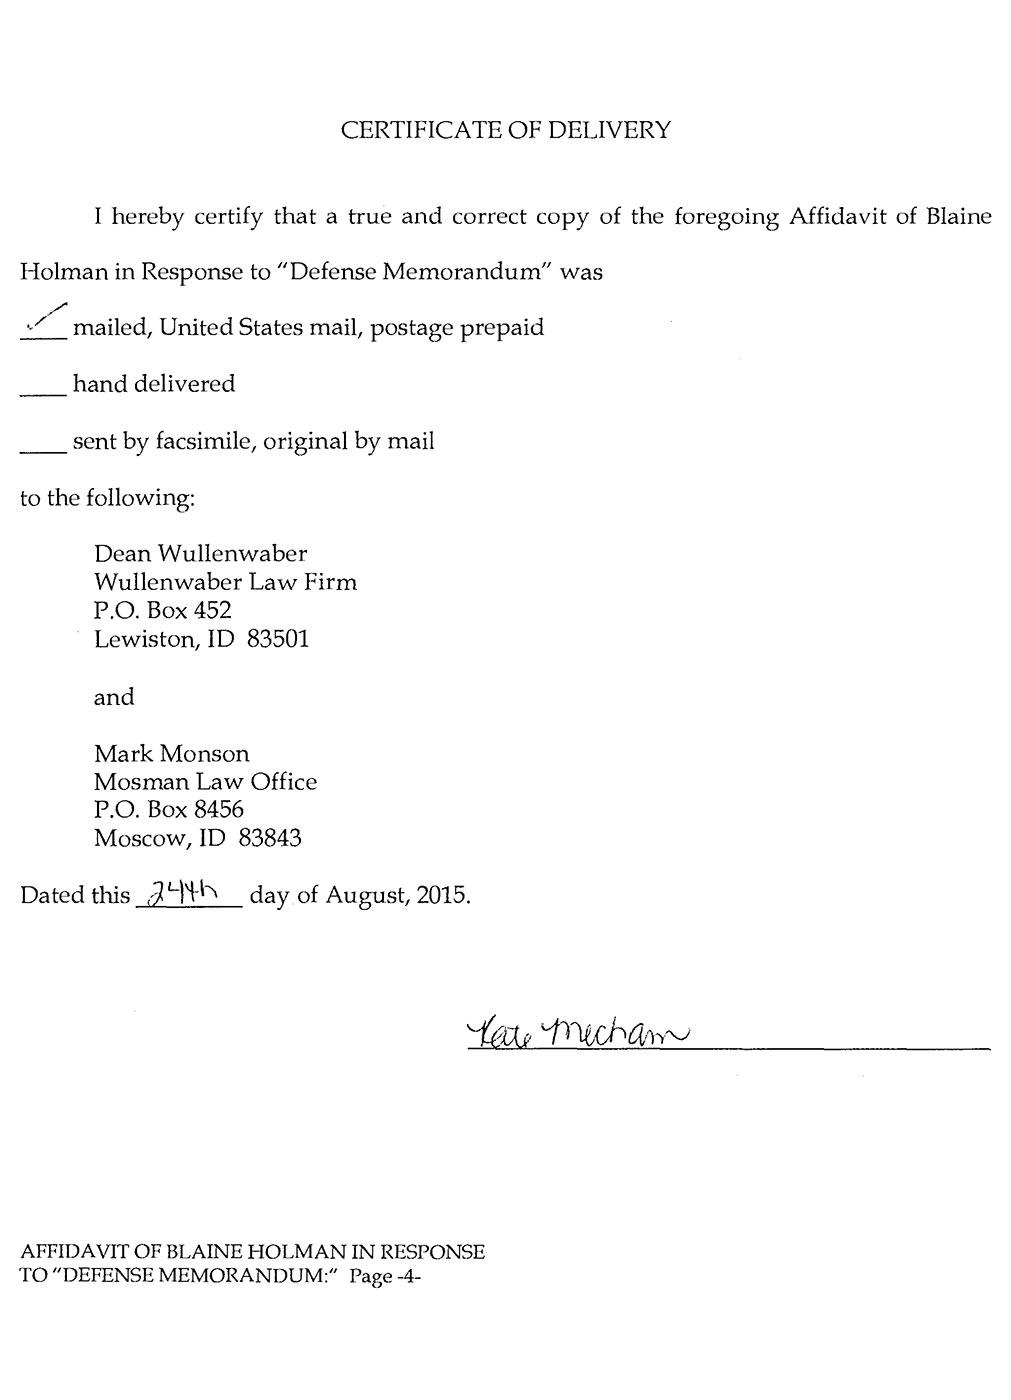 Blaine Holman Affidavit Page 4